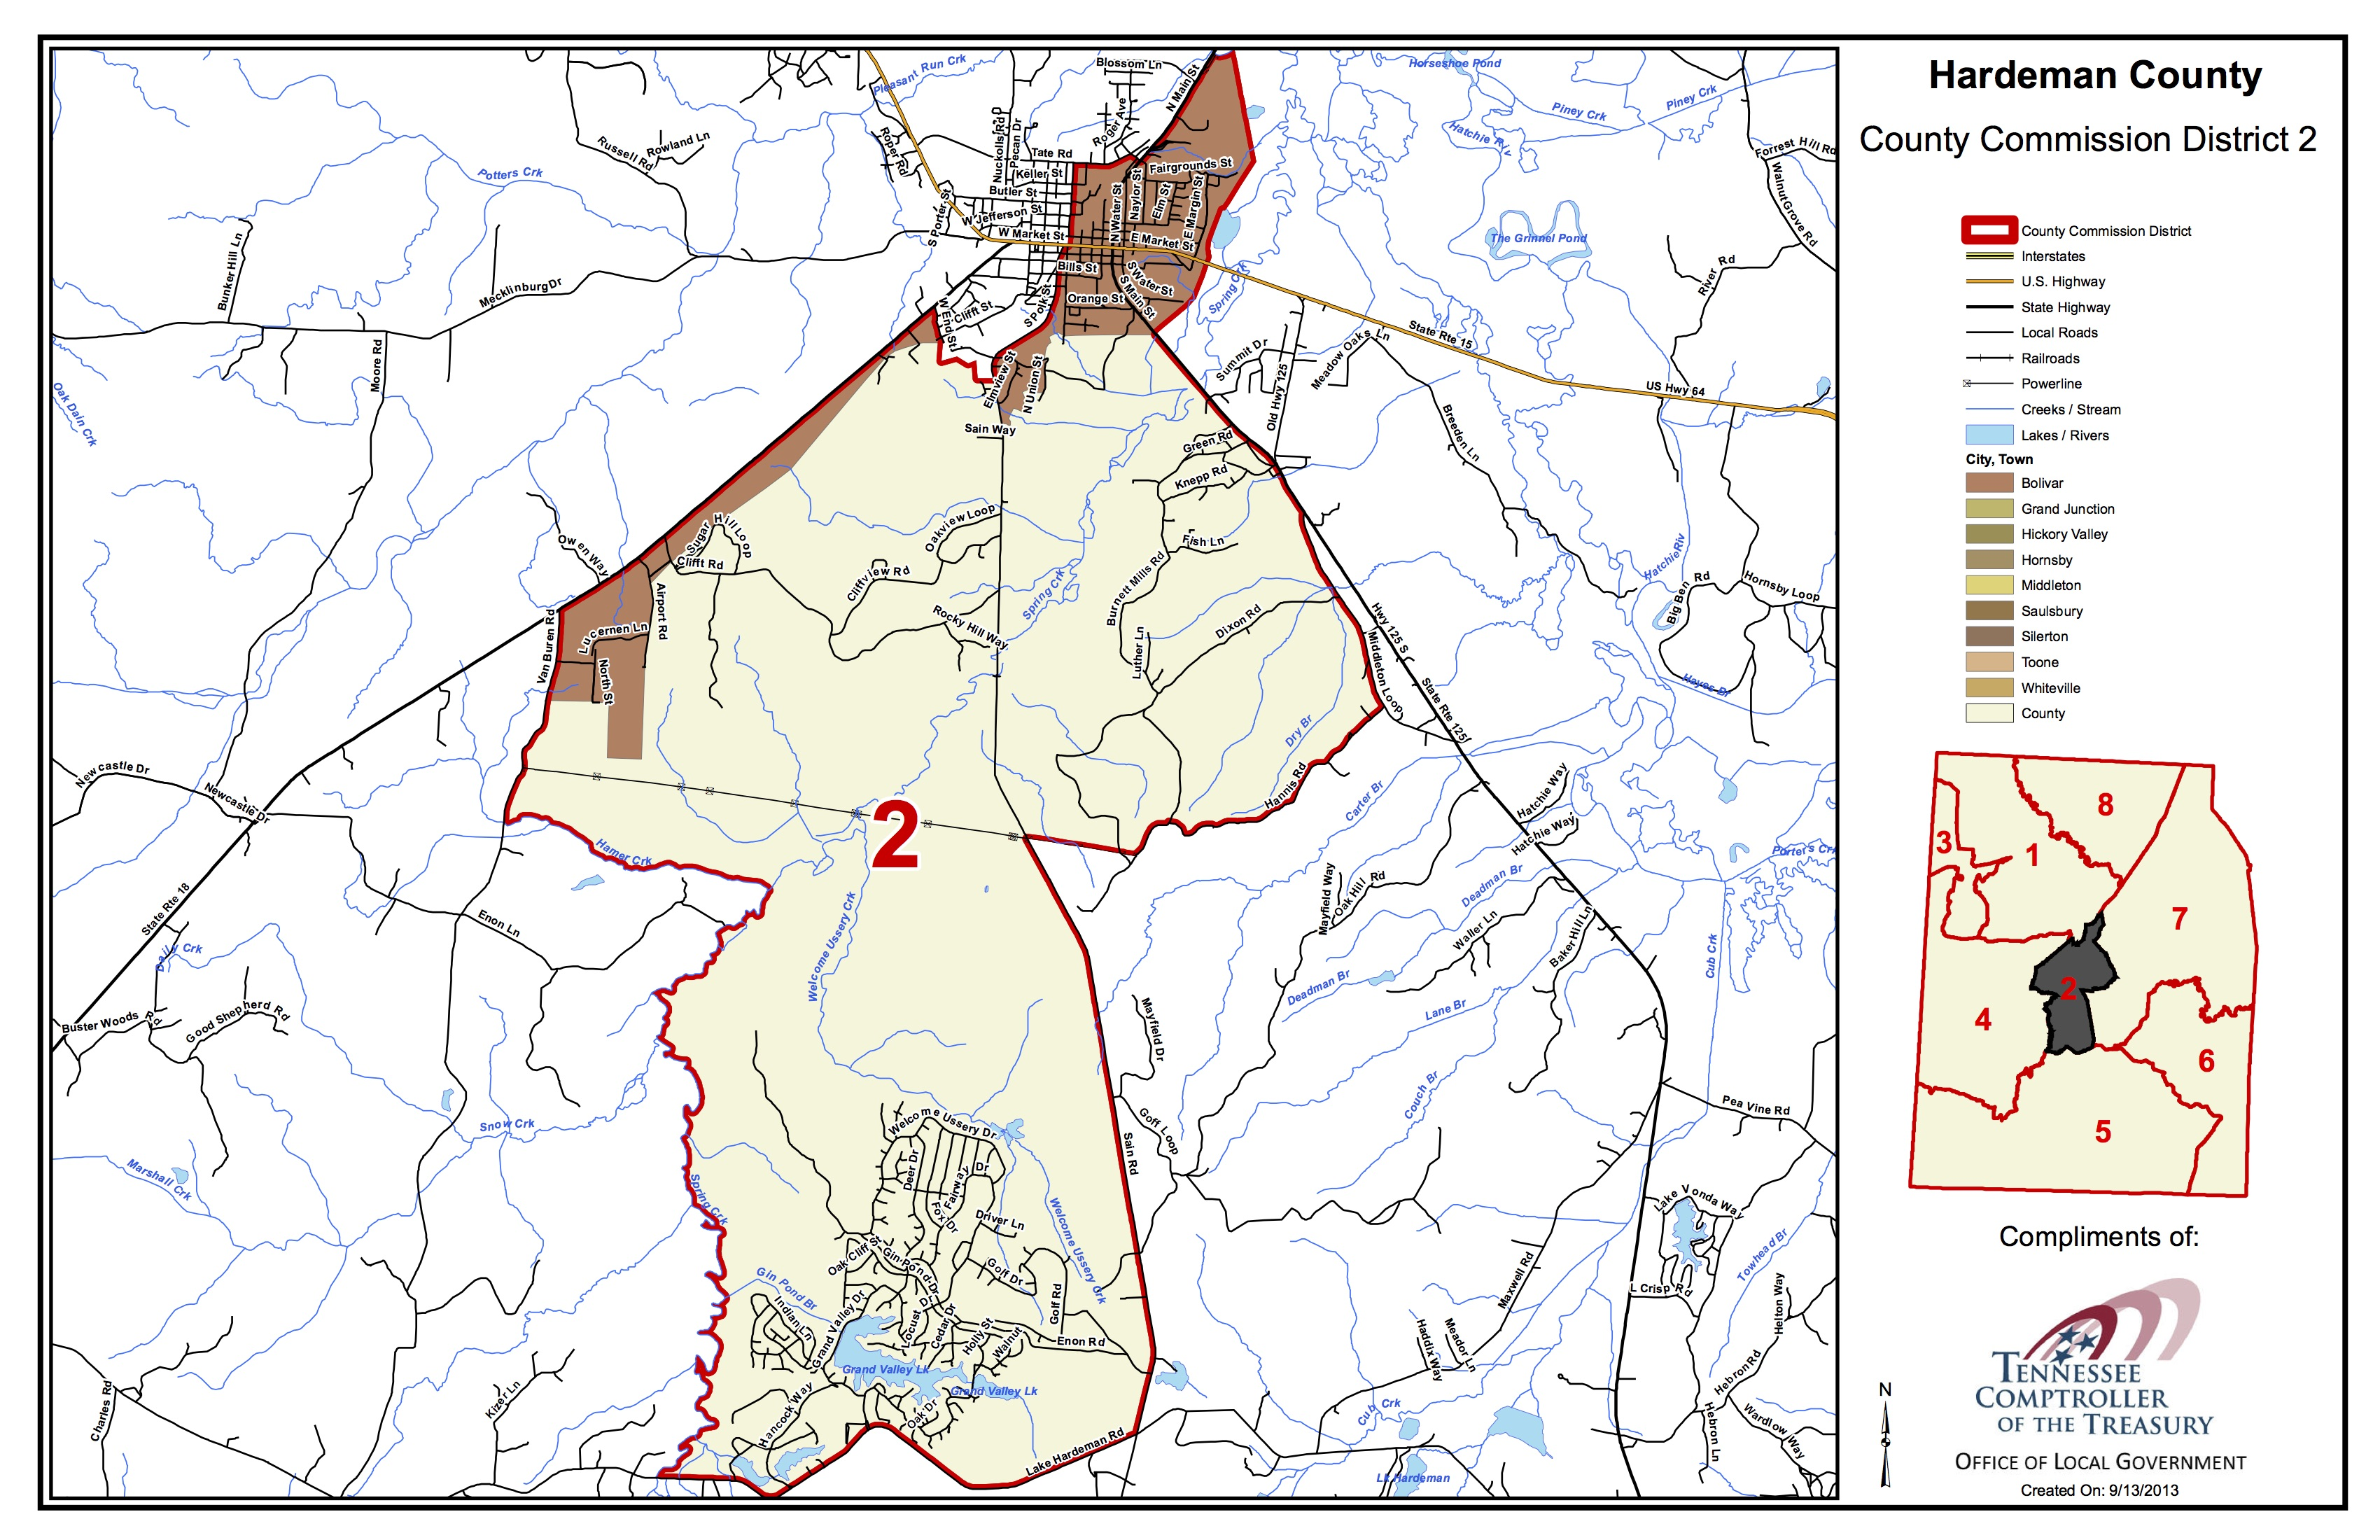 Hardeman County, TN Zip Code Wall Map Basic Style by